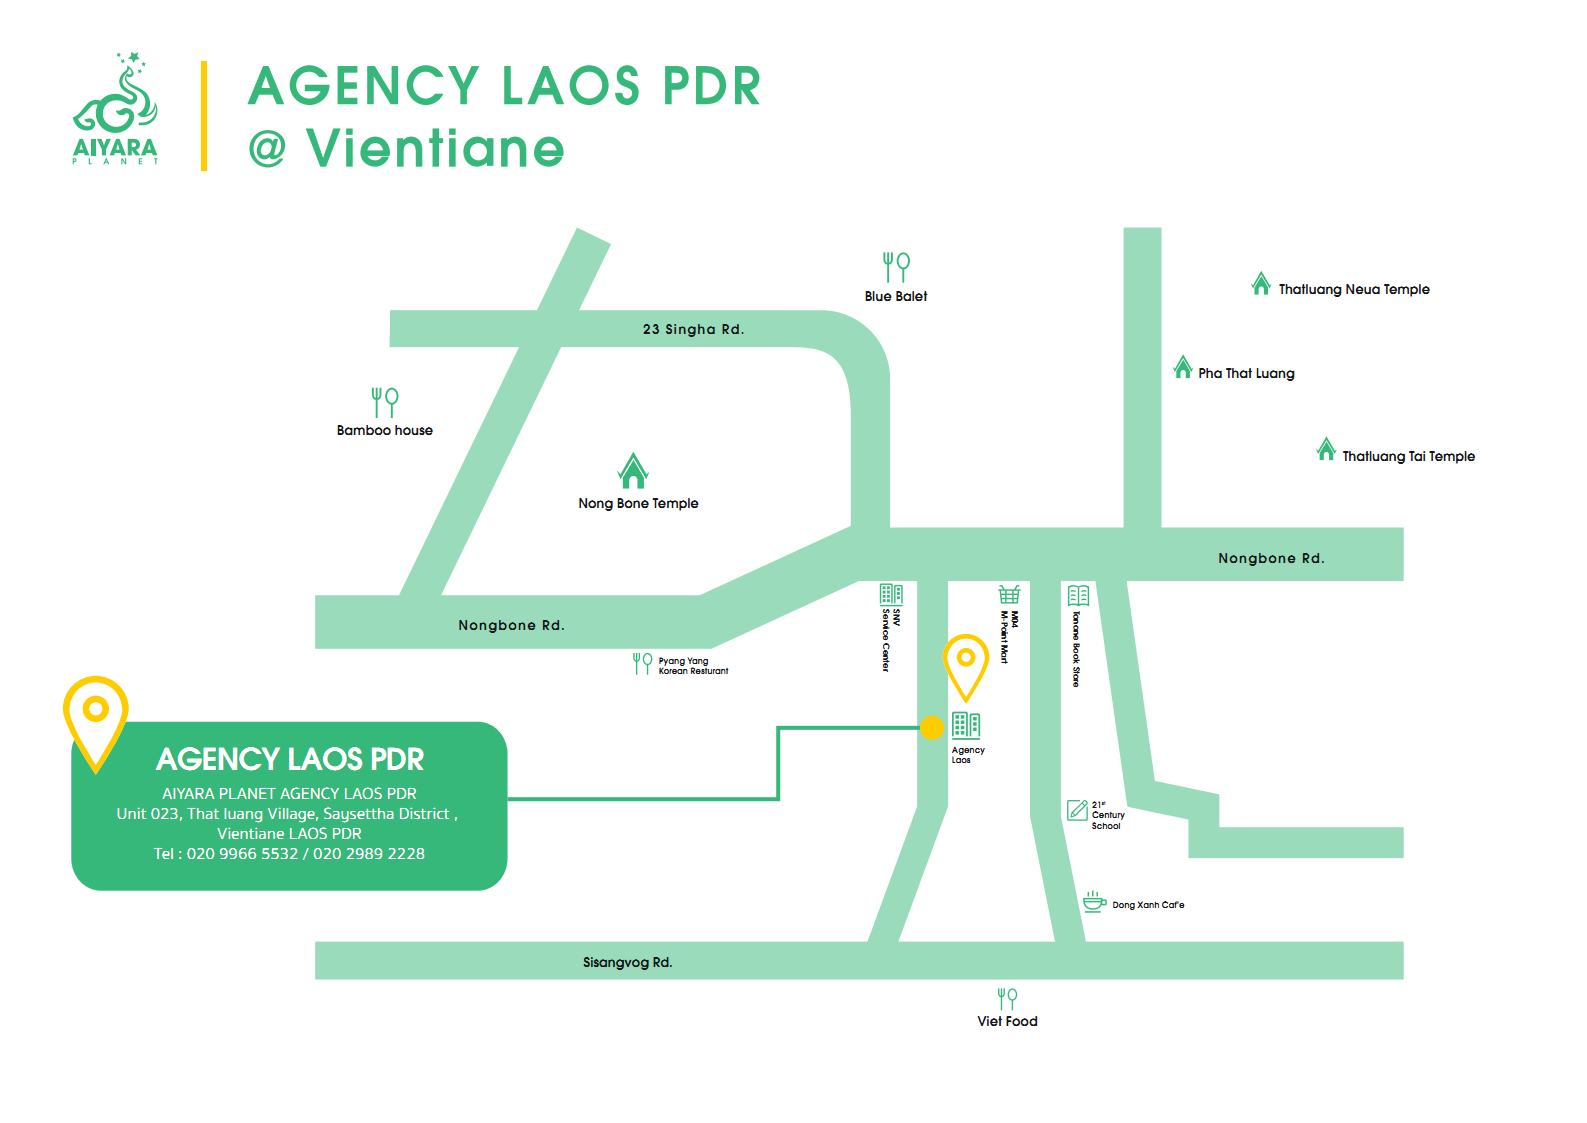 AIYARA AGENCY VIENTIANE, LAOS